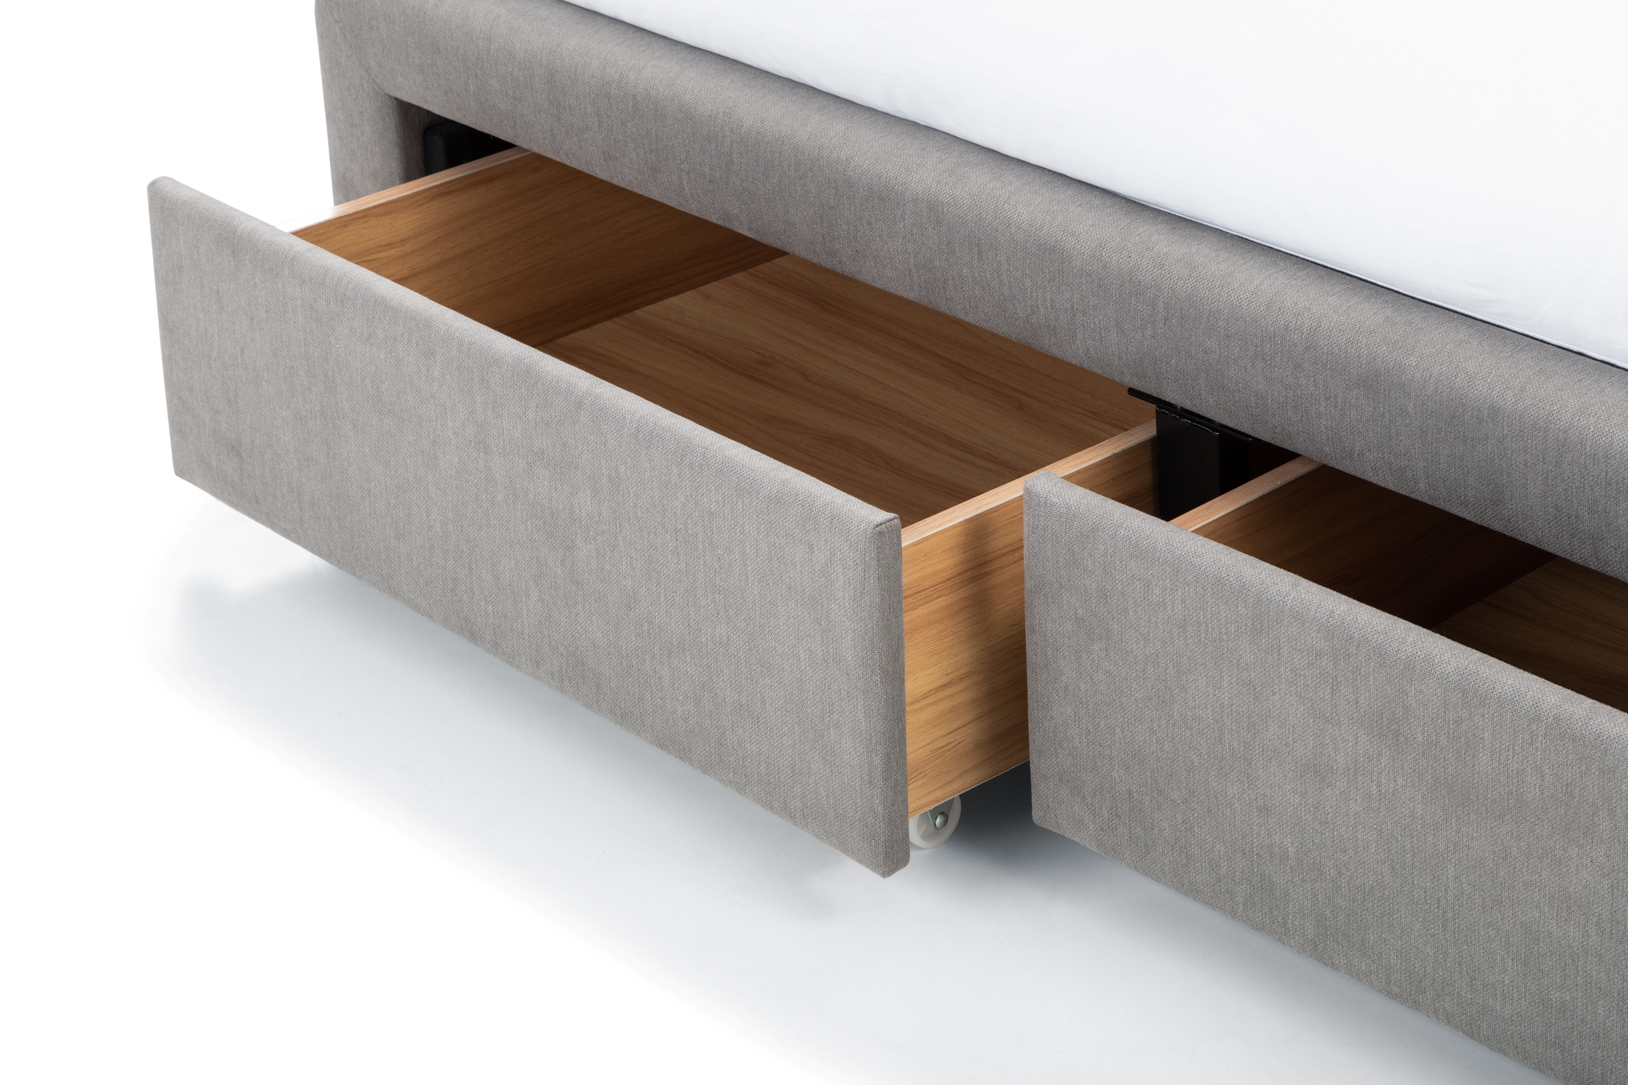 Fullerton 5' Fabric Bed